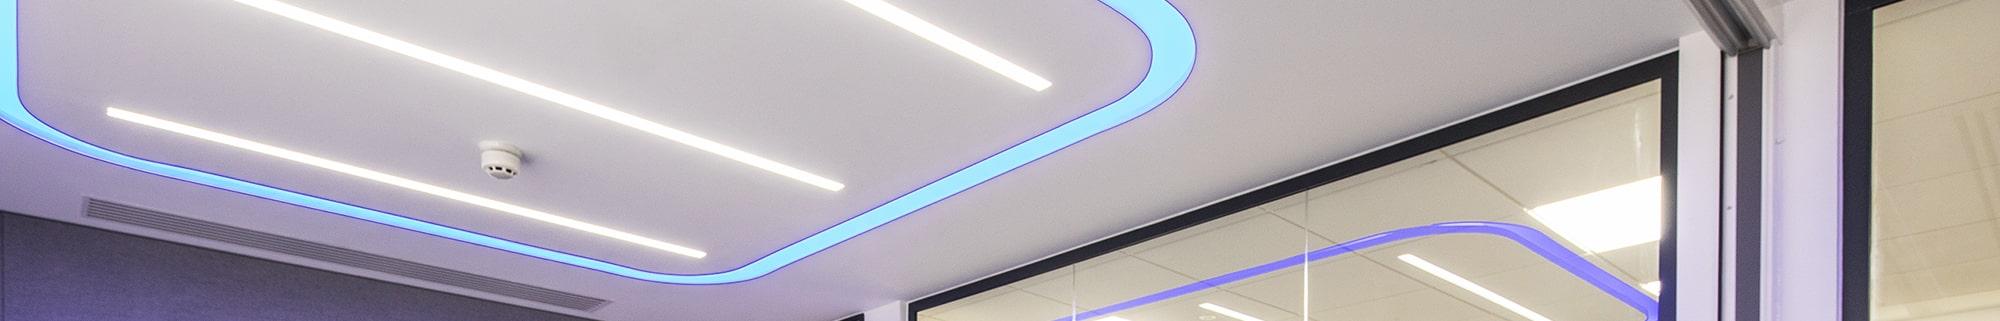 feature lighting panasonic banner